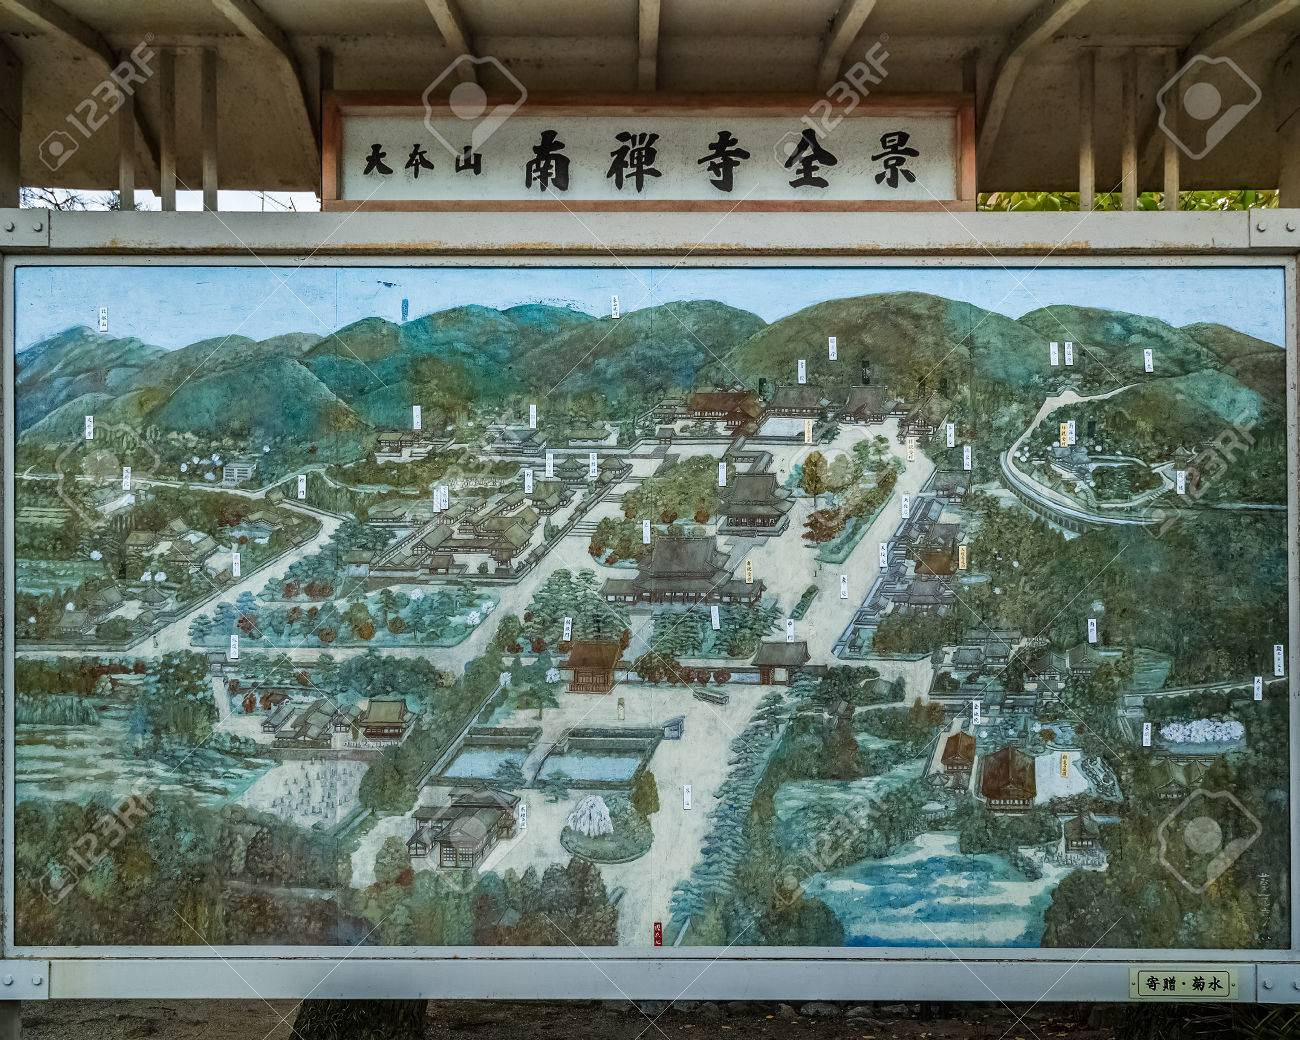 KYOTO JAPAN OCTOBER Nanzenji Temple In Kyoto Japan On - Japan map 2014